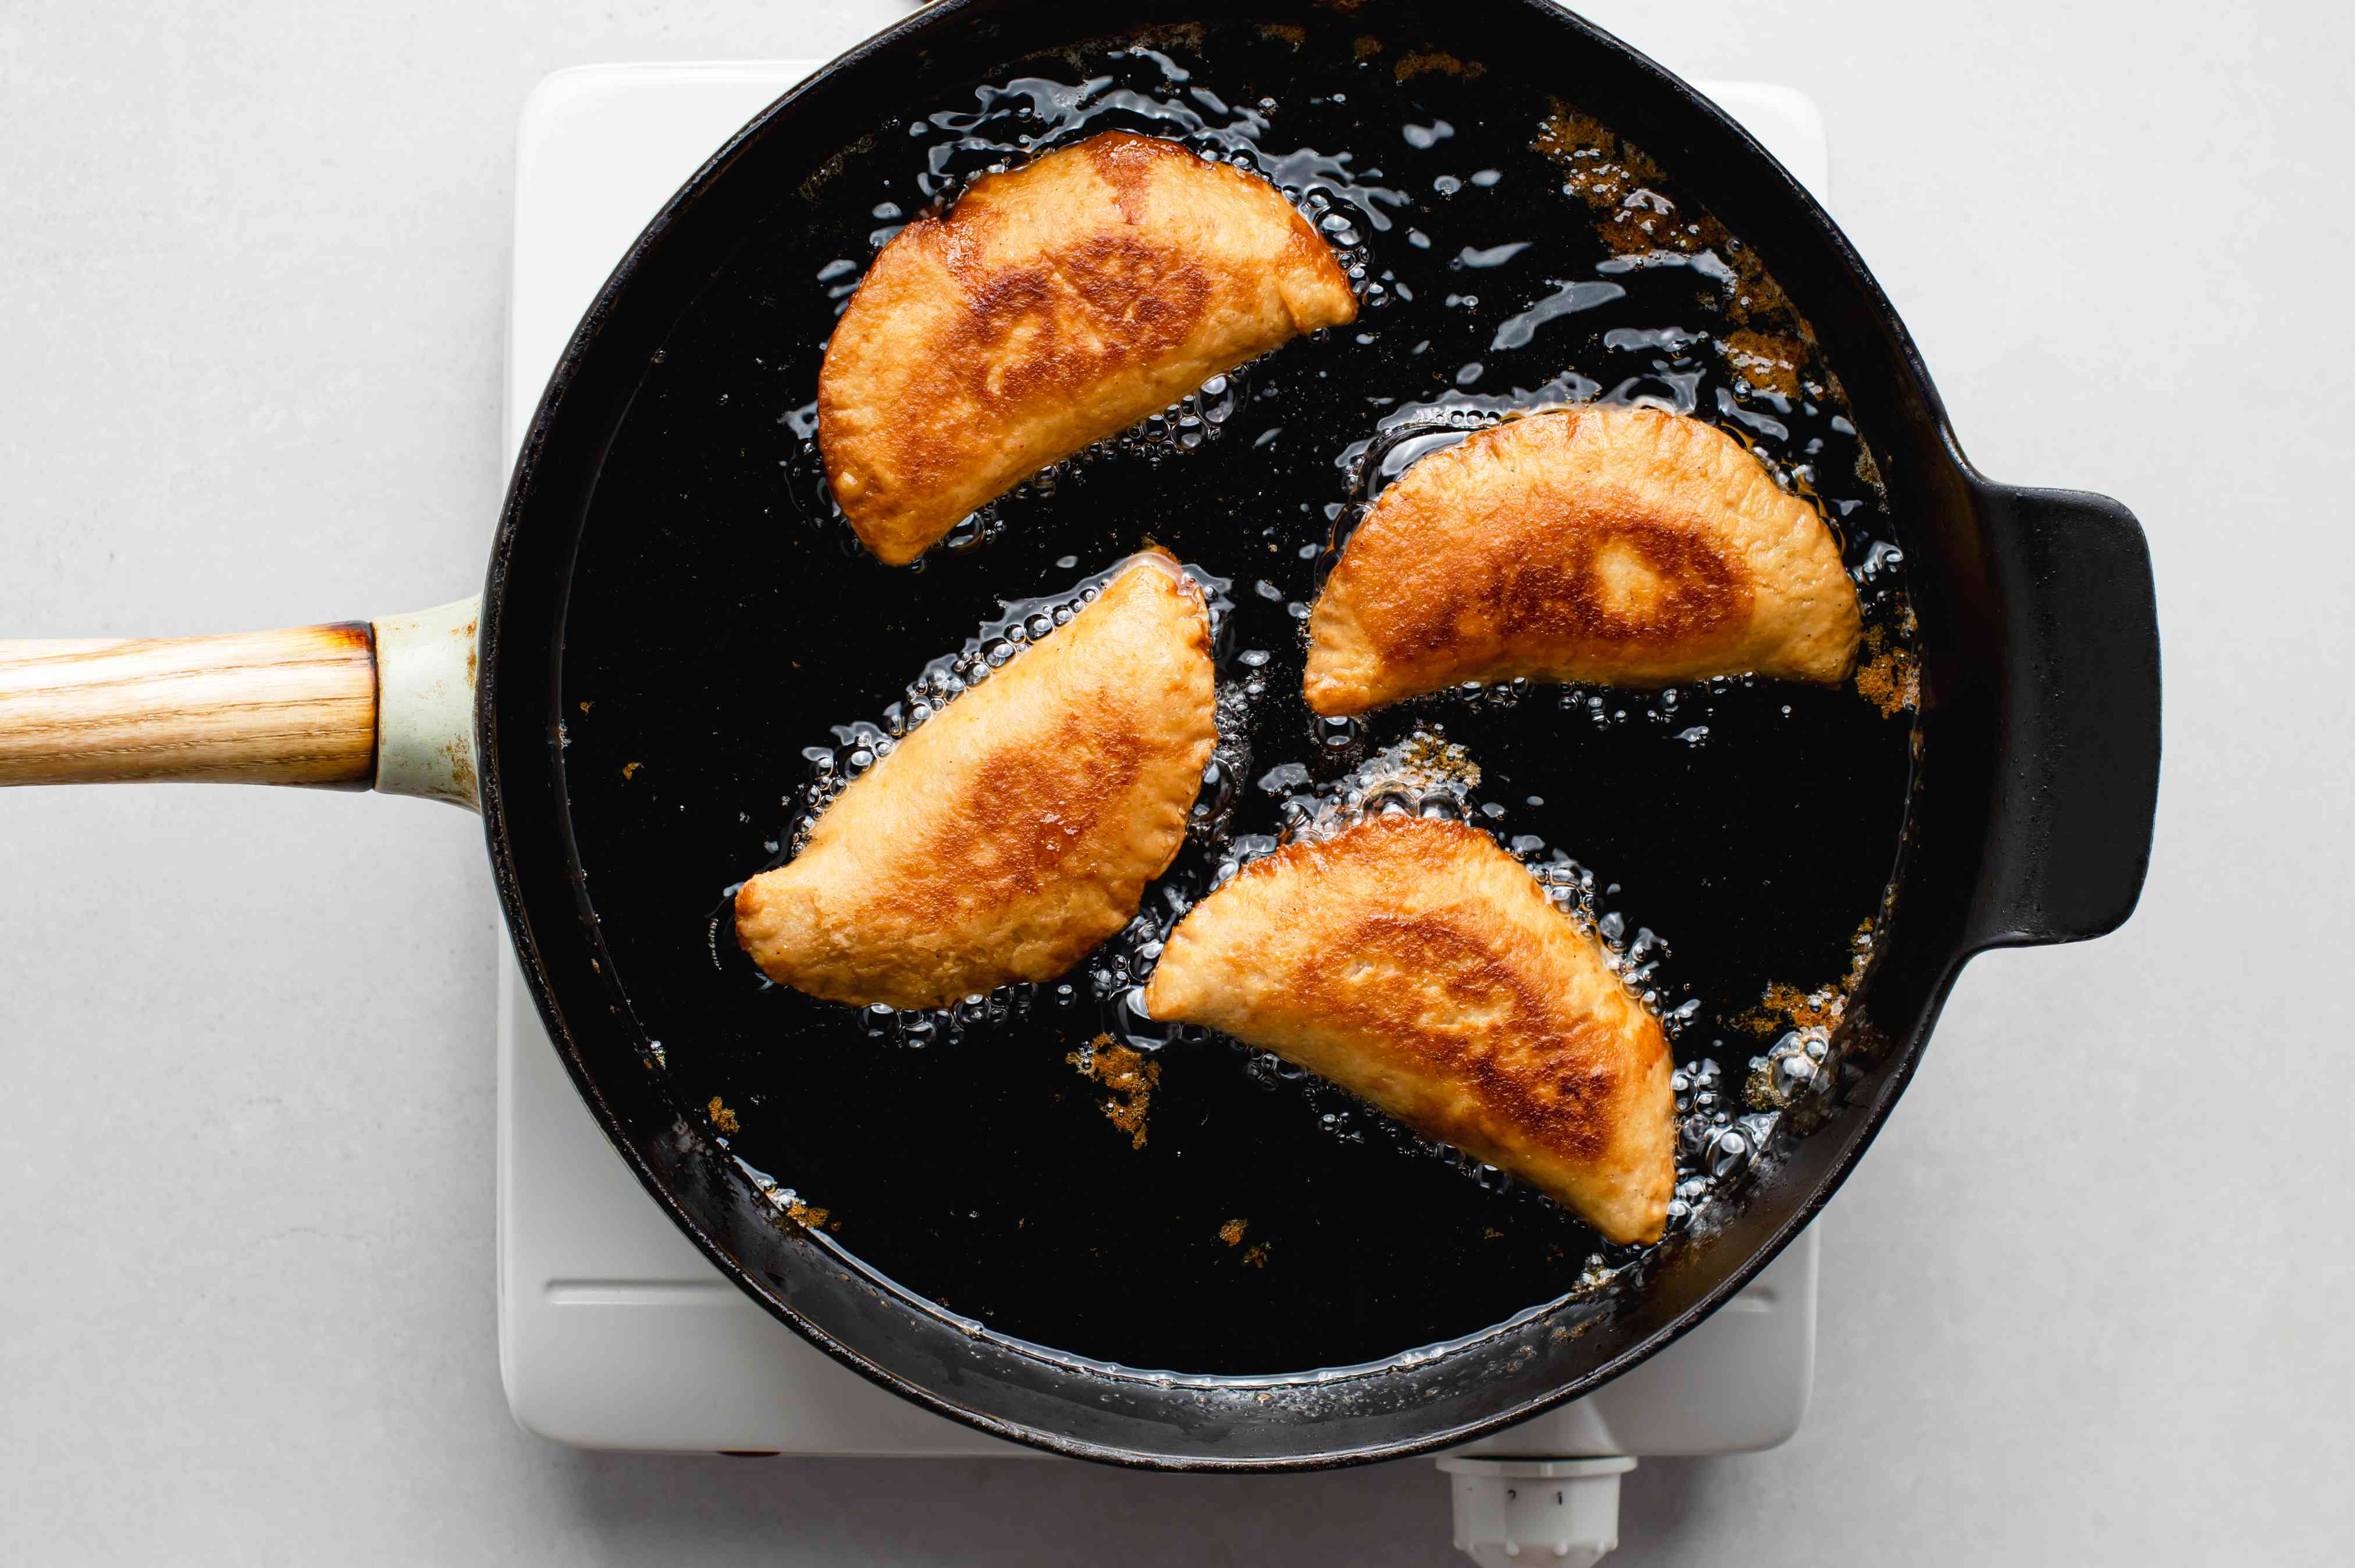 empanadas frying in oil